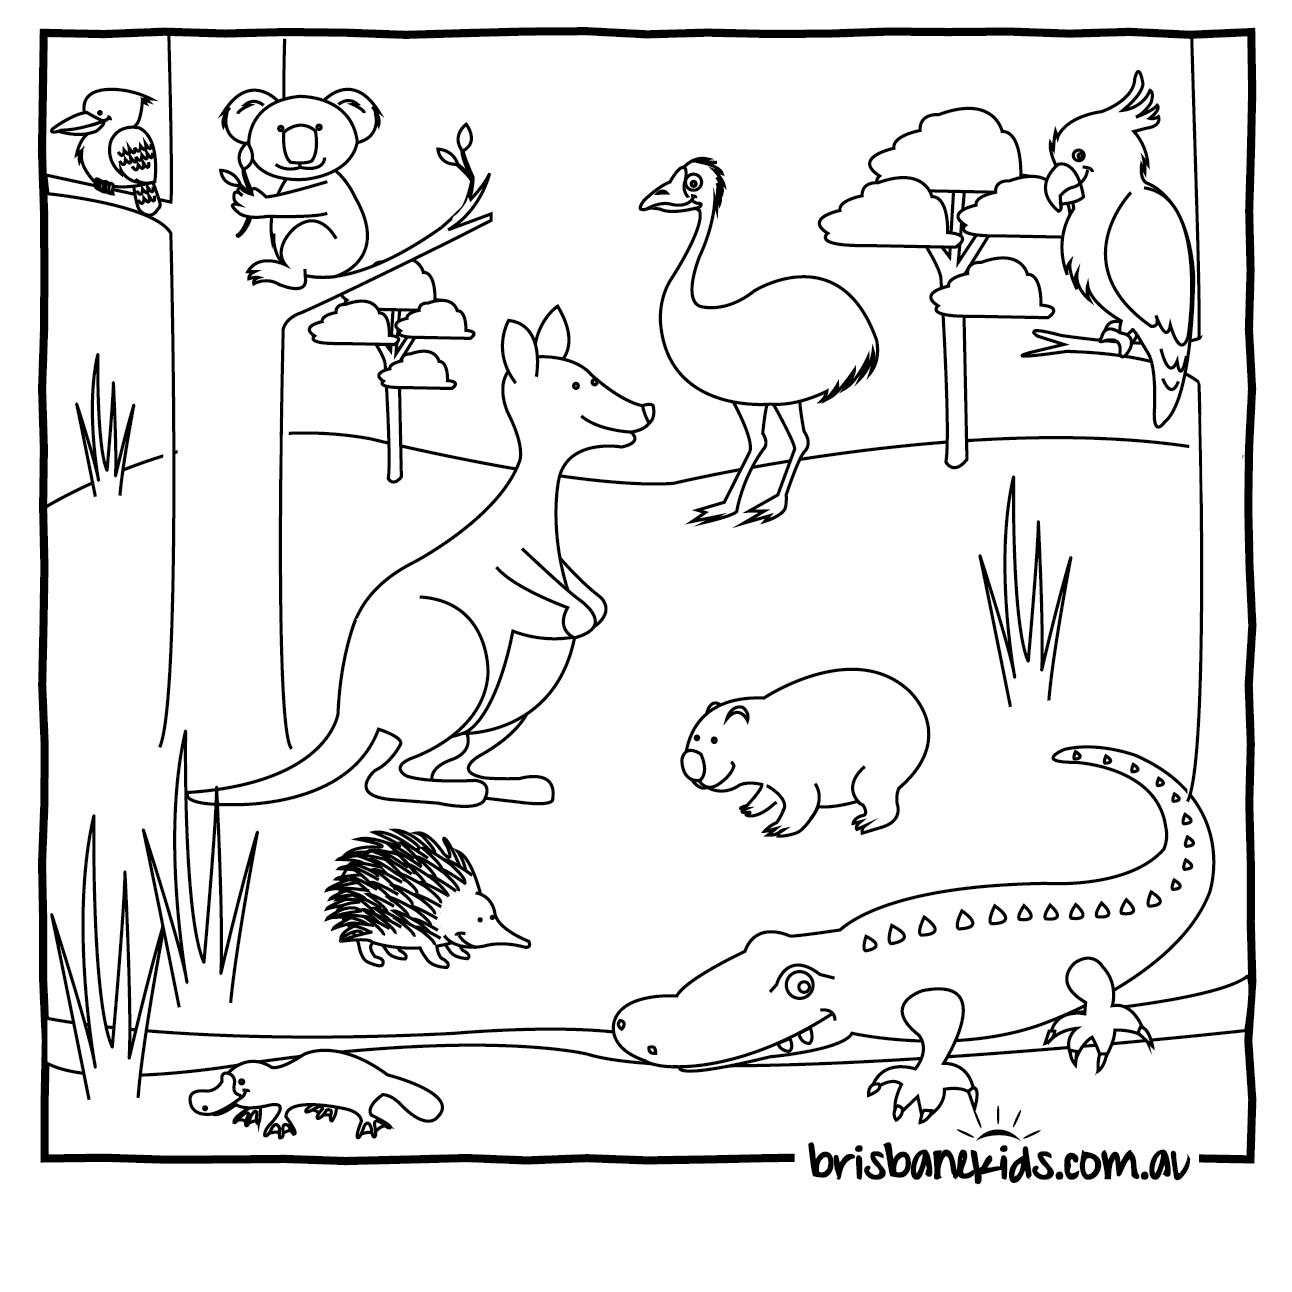 Australian Animals Colouring Pages   Brisbane Kids - Free Printable Australian Animals